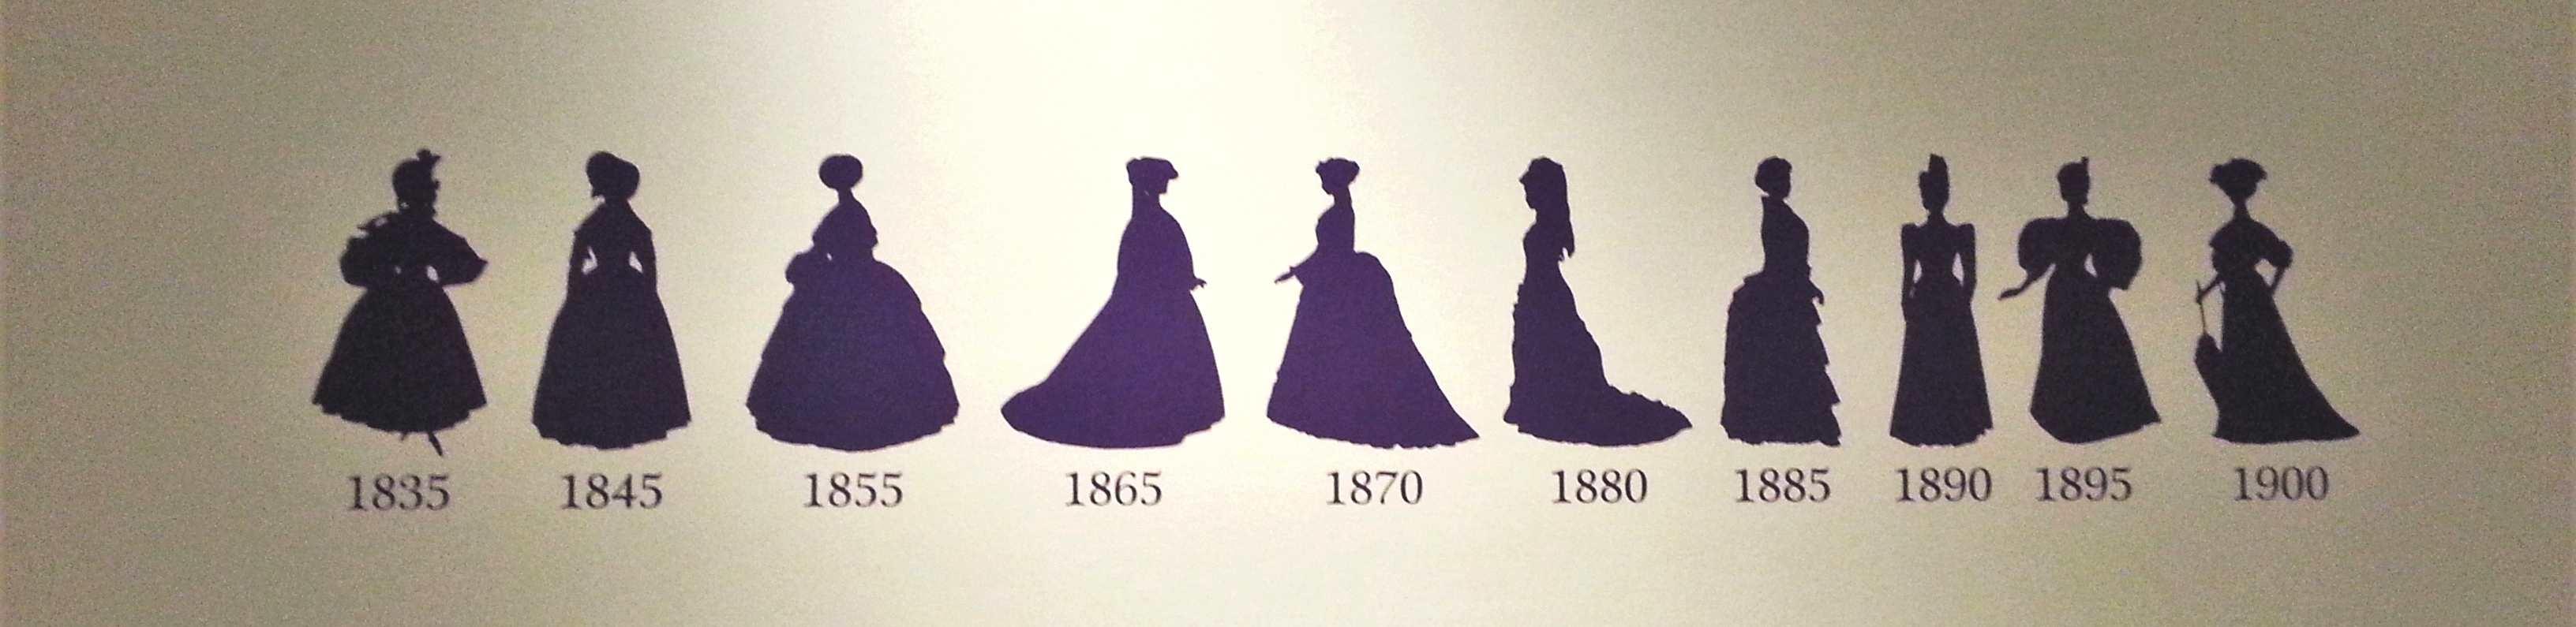 banniere-hardelot-fashion